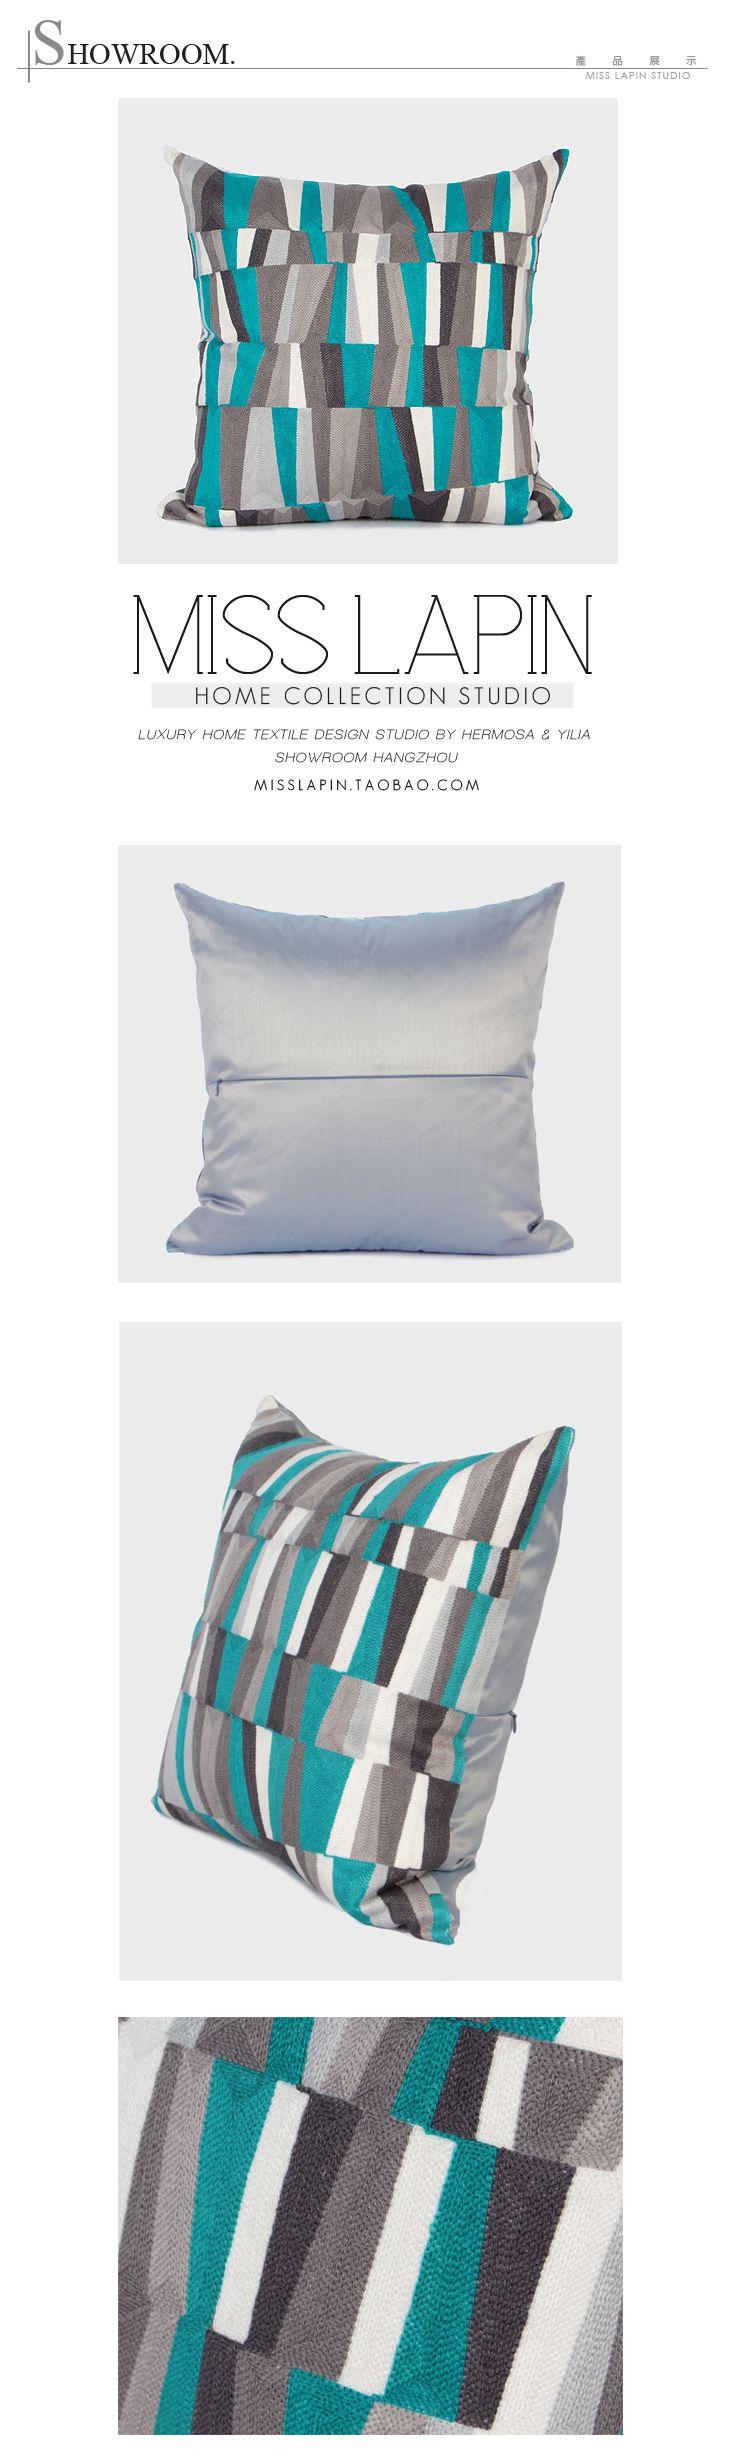 MISS LAPIN澜品家居/北欧极简沙发床头抱枕靠包/湖蓝色几何图形绣花方枕/布艺pillow /cushion /cushion cover-淘宝网